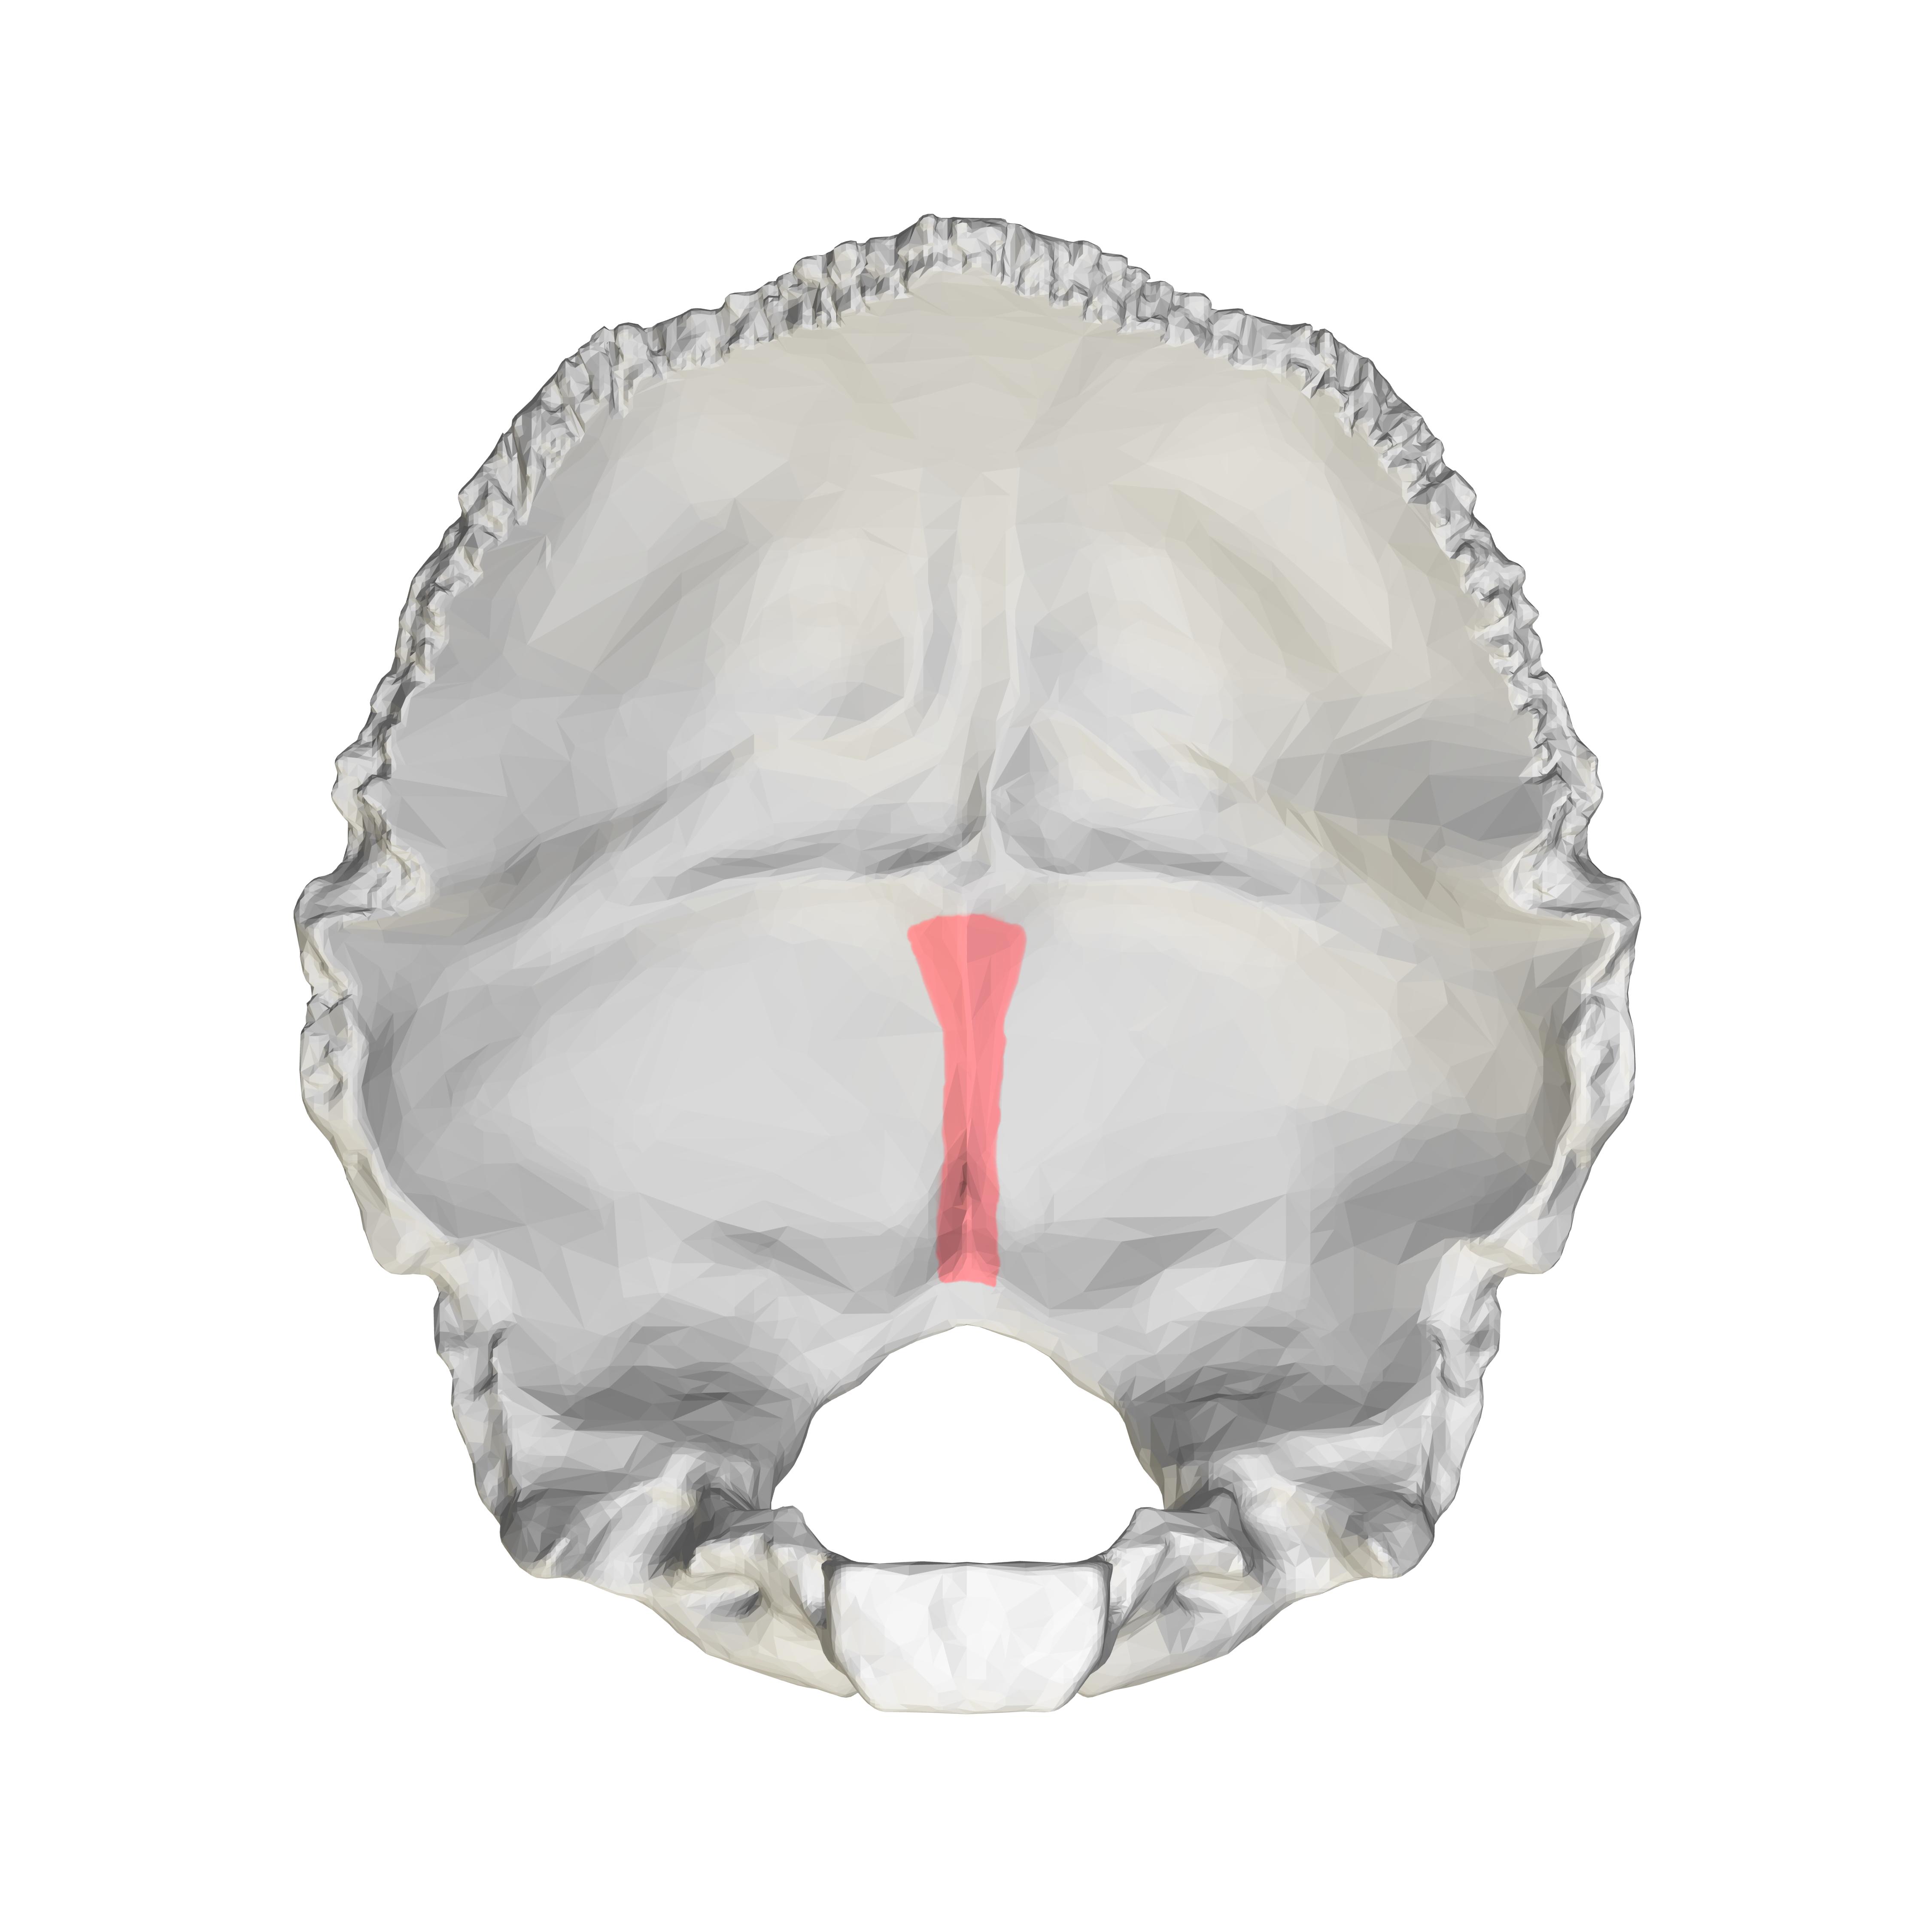 File:Internal occipital crest - close-up.png - Wikimedia ...